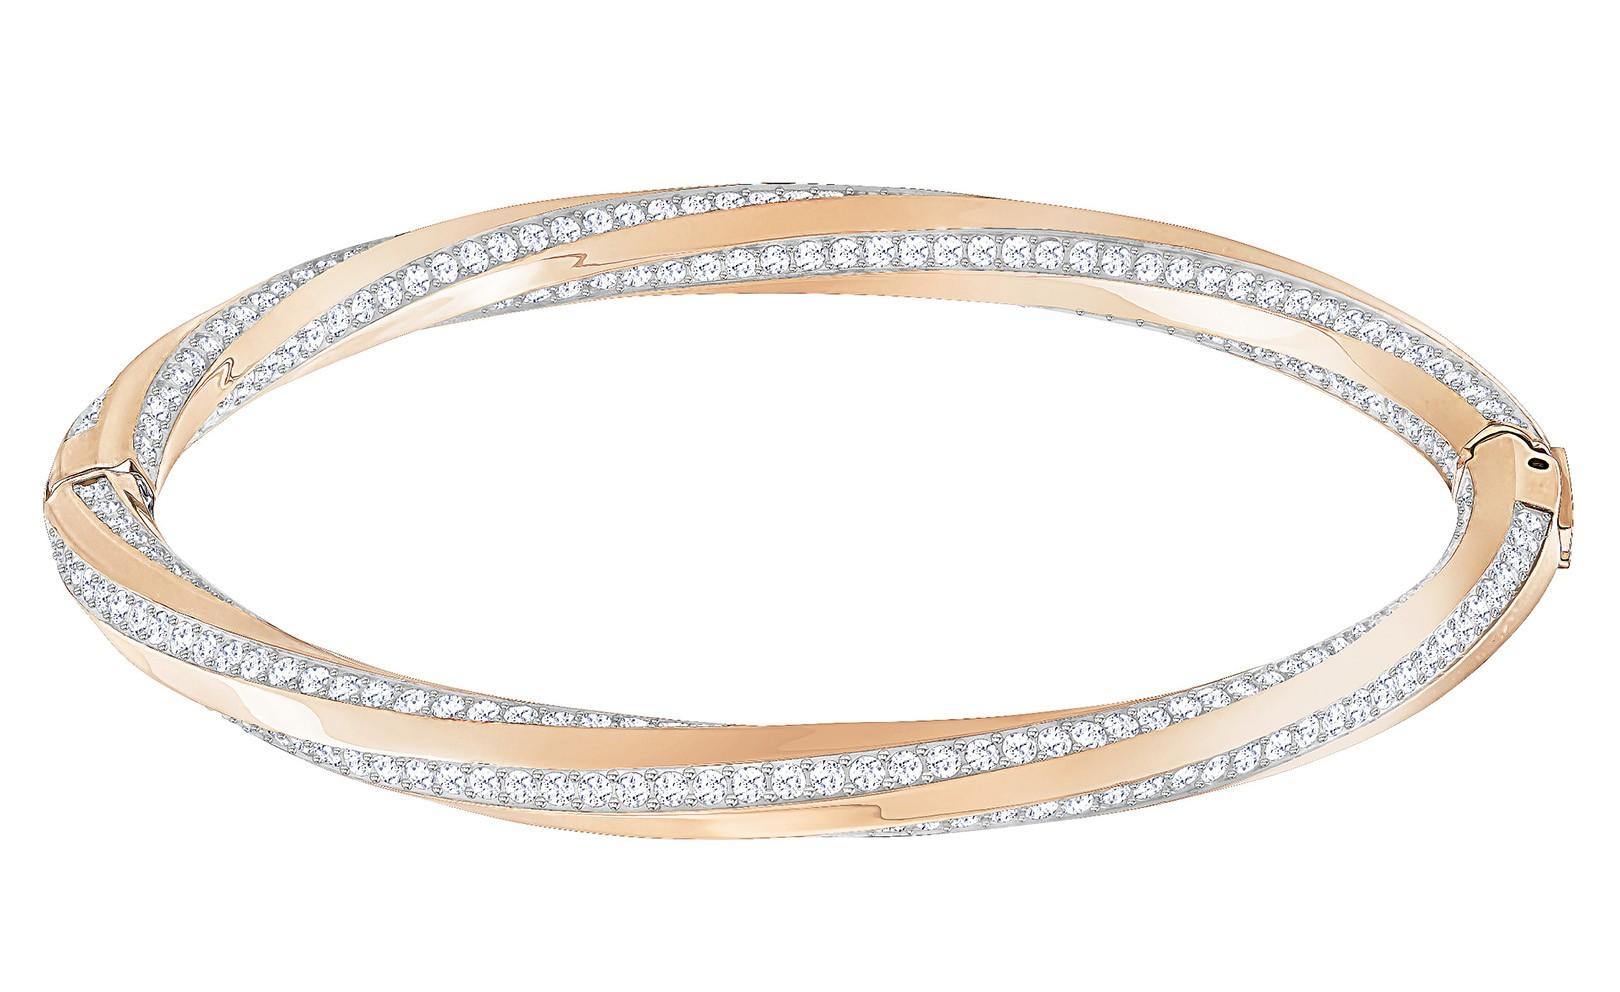 Swarovski Armband Hilt Bangle rosékleurig M 5289409